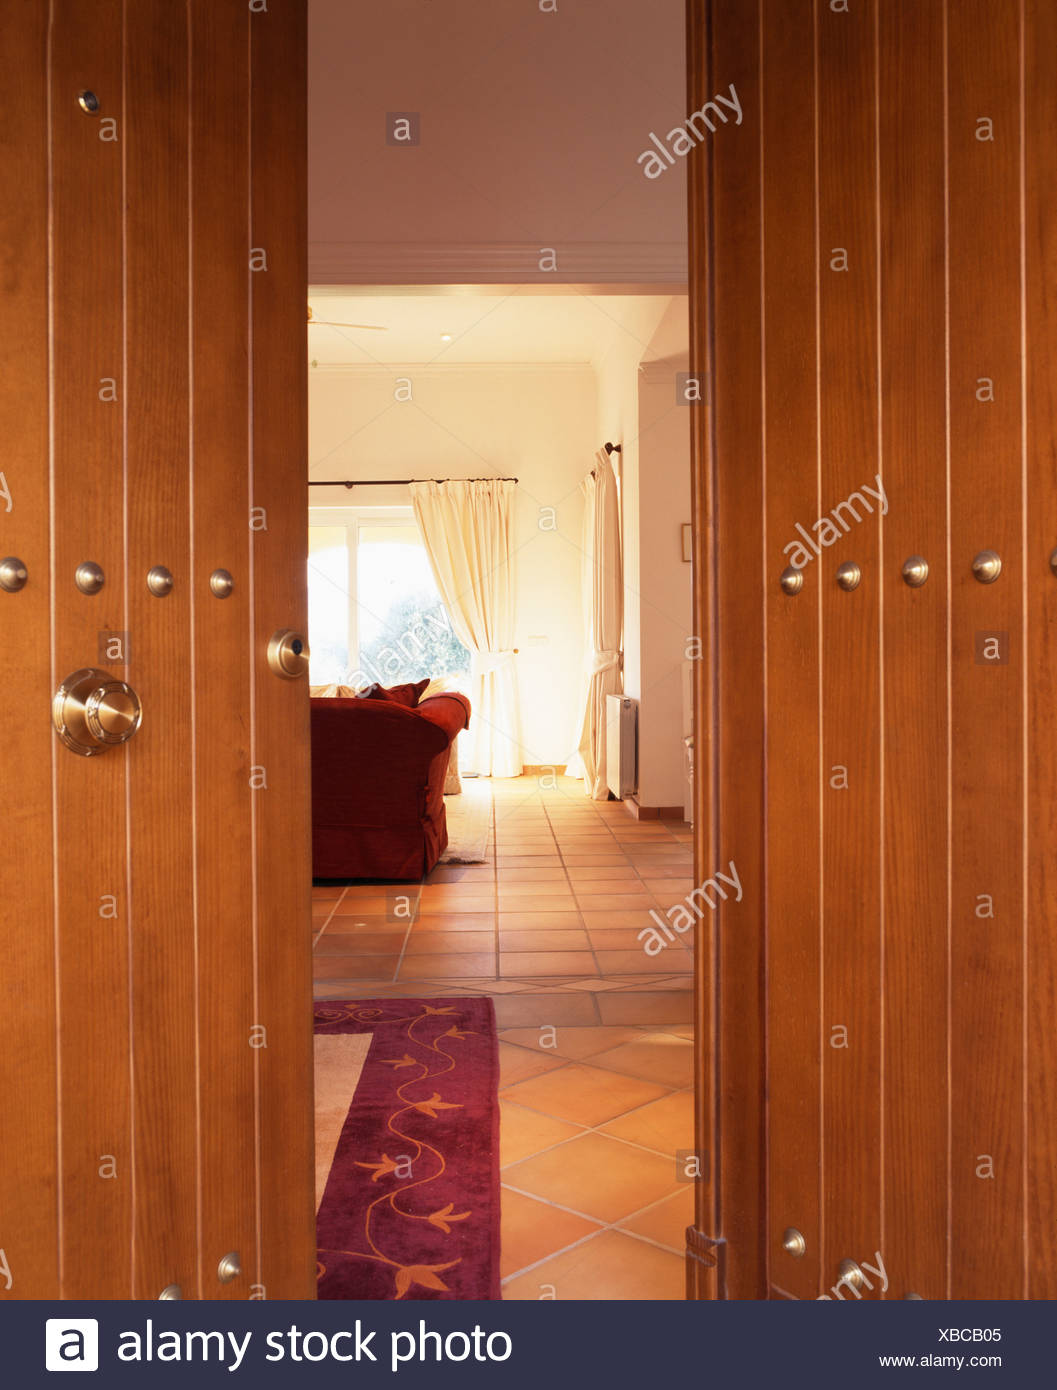 Double Wooden Doors Open To Hall In Spanish Villa Stock Photo